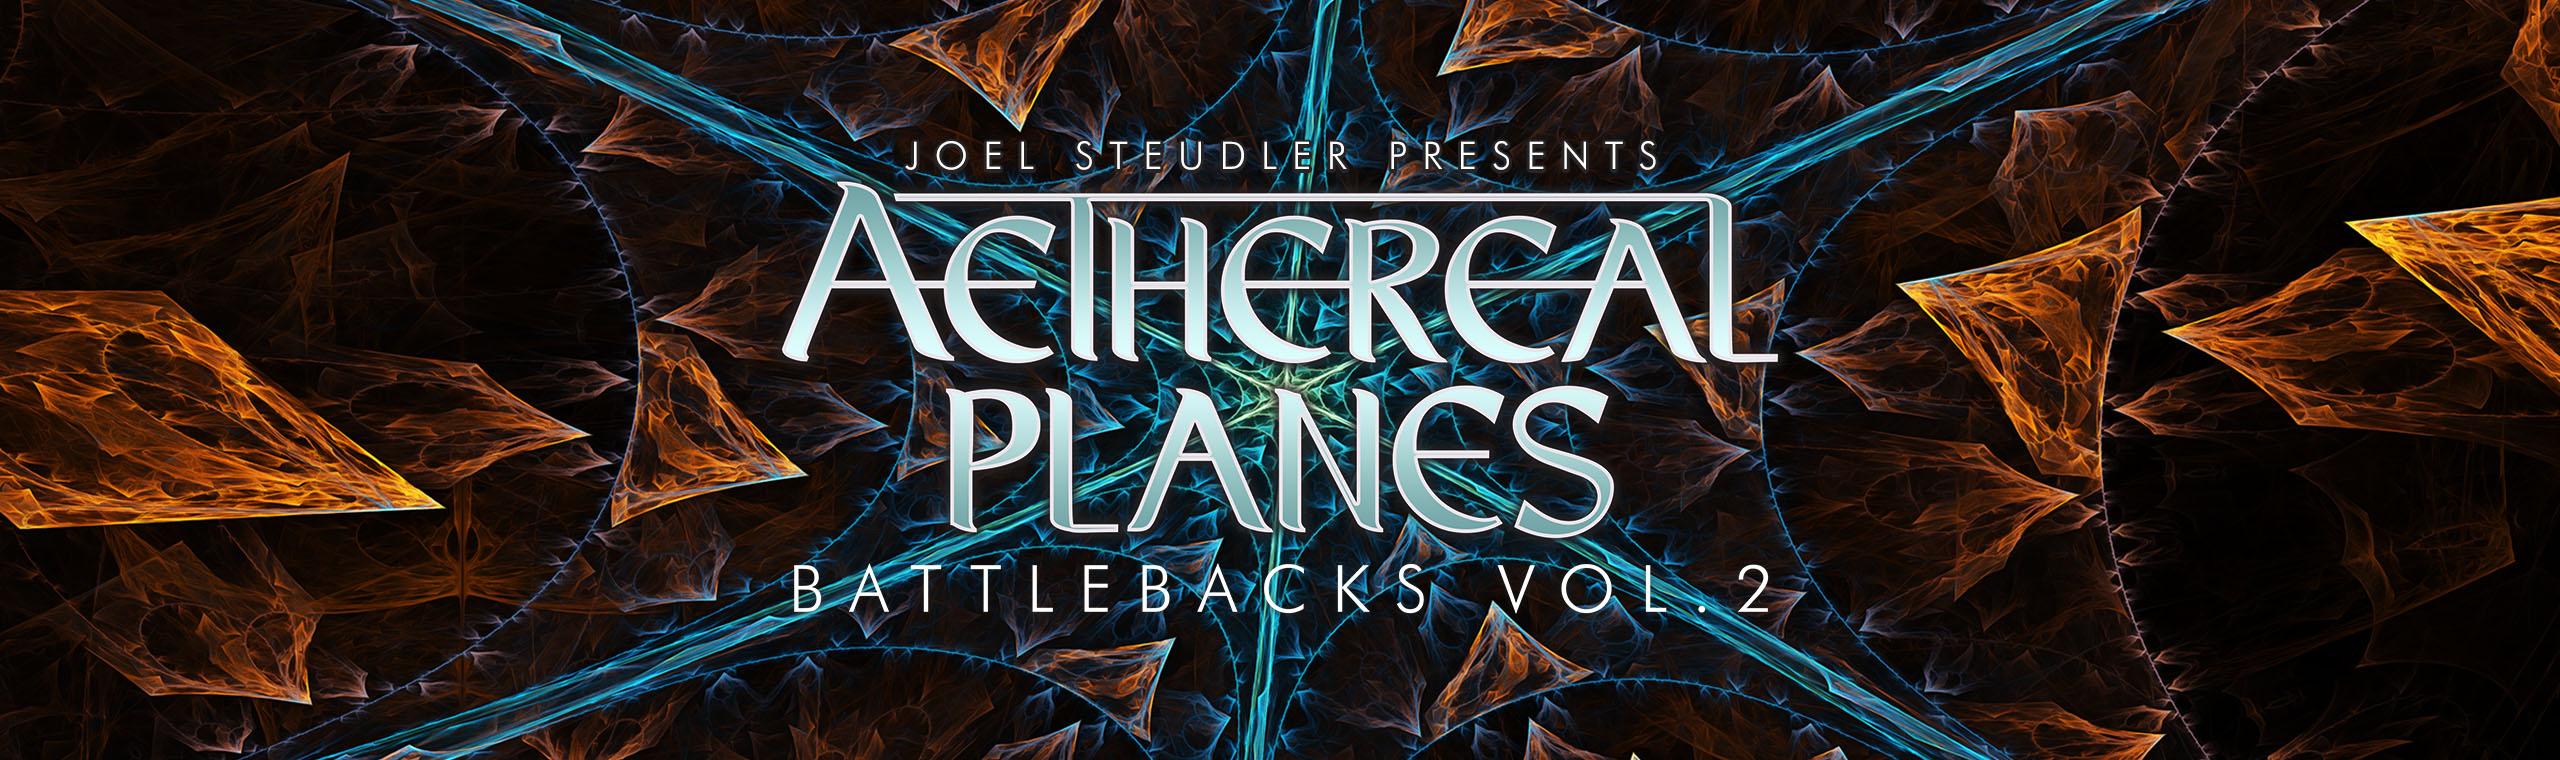 Aethereal Planes Battlebacks Vol 2